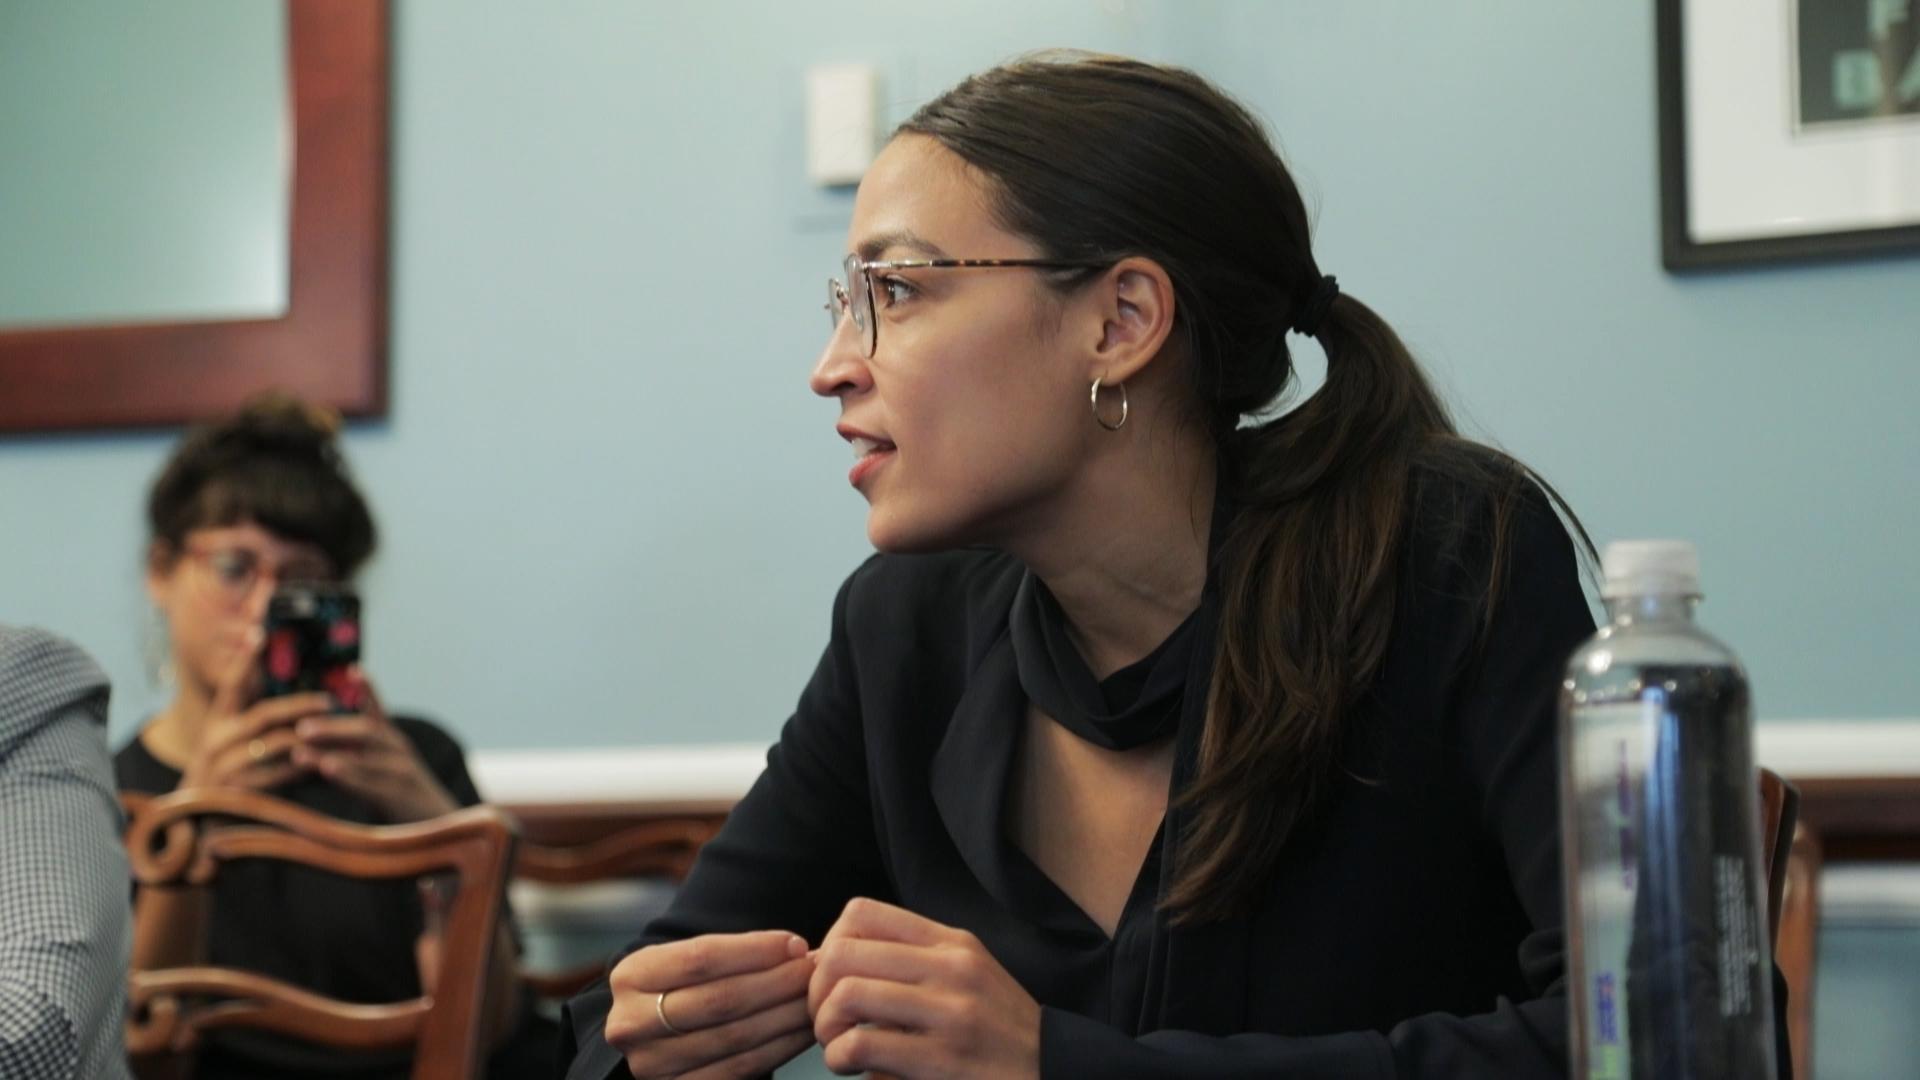 Alexandria Ocasio-Cortez Makes Her First House Endorsement Against Democratic Incumbent